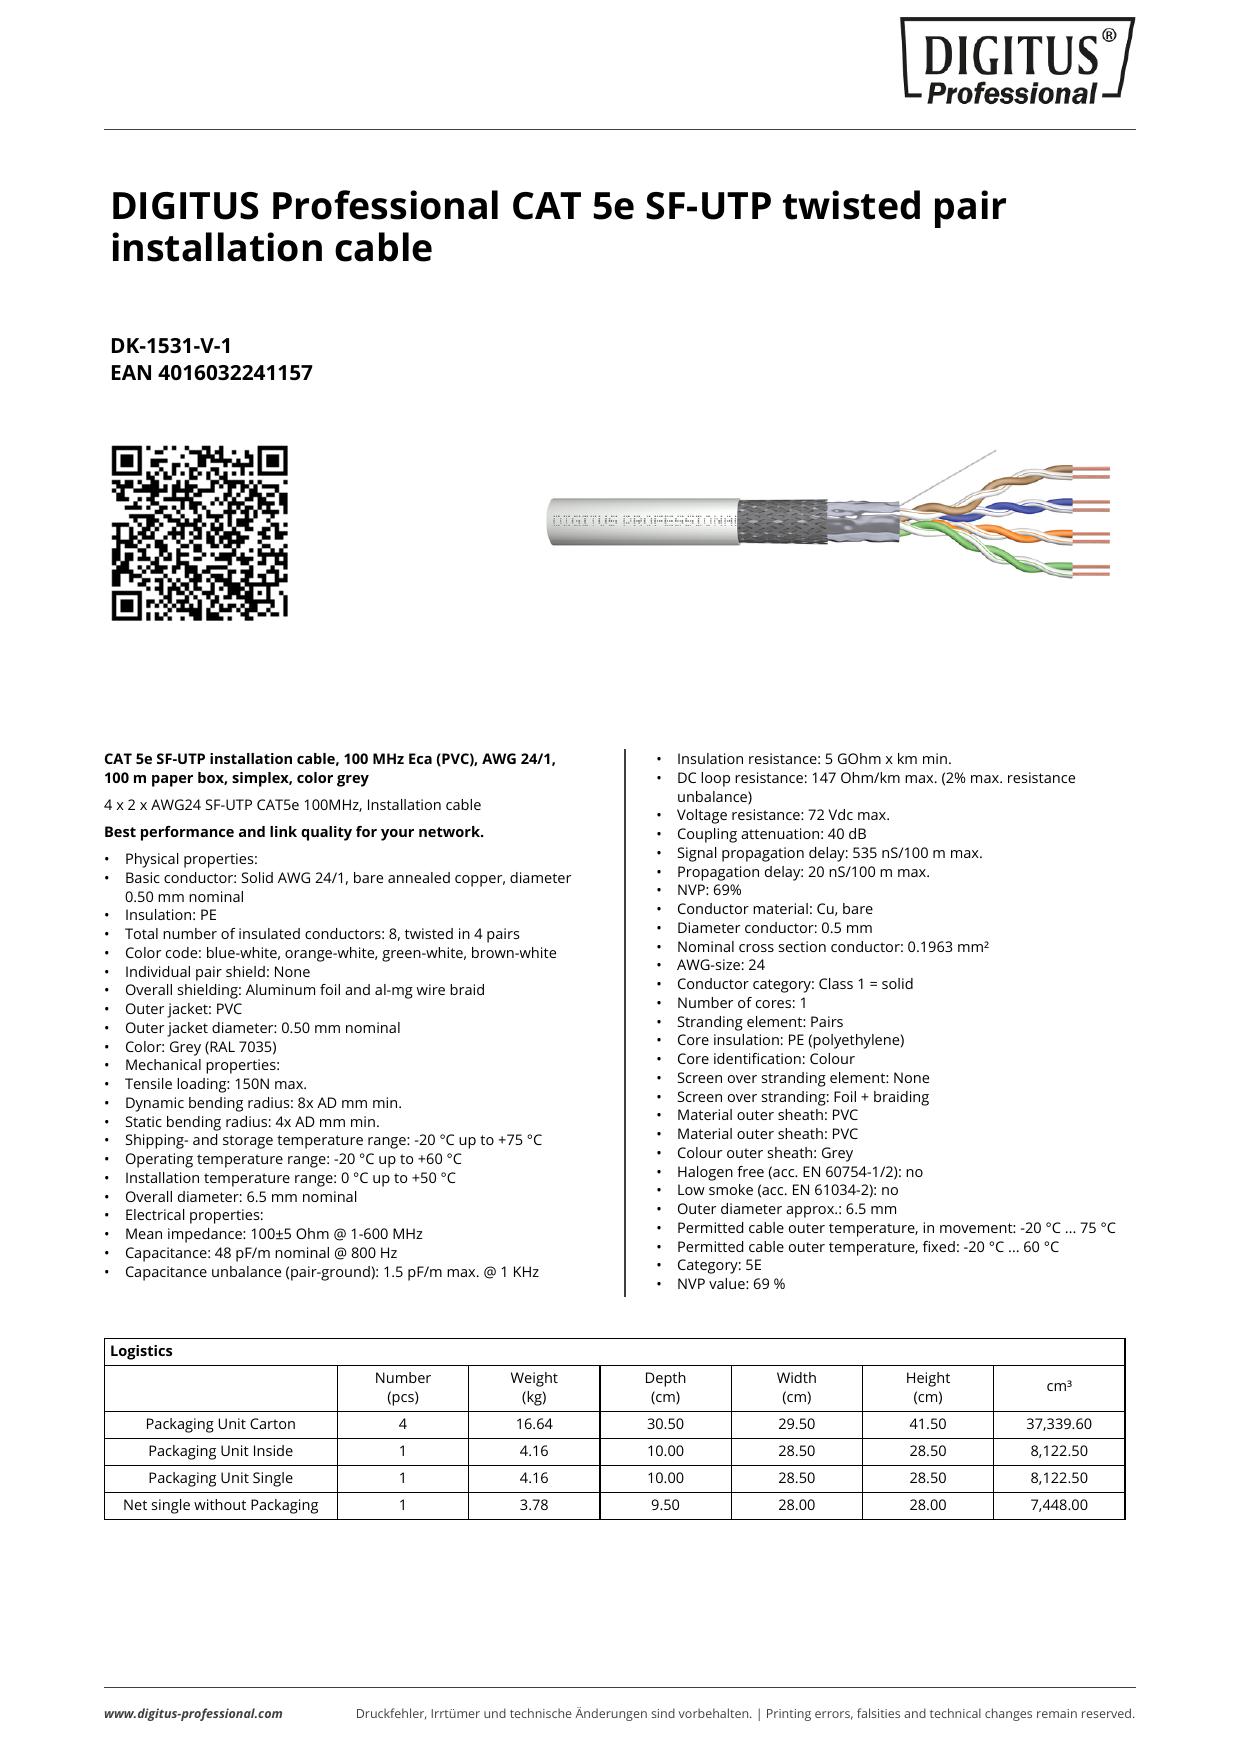 SMBJ26A-E3//52 TVS UNIDIRECT 600W 26V 5/% SMB SMBJ26A-E3 SMBJ26 26A 20PCS